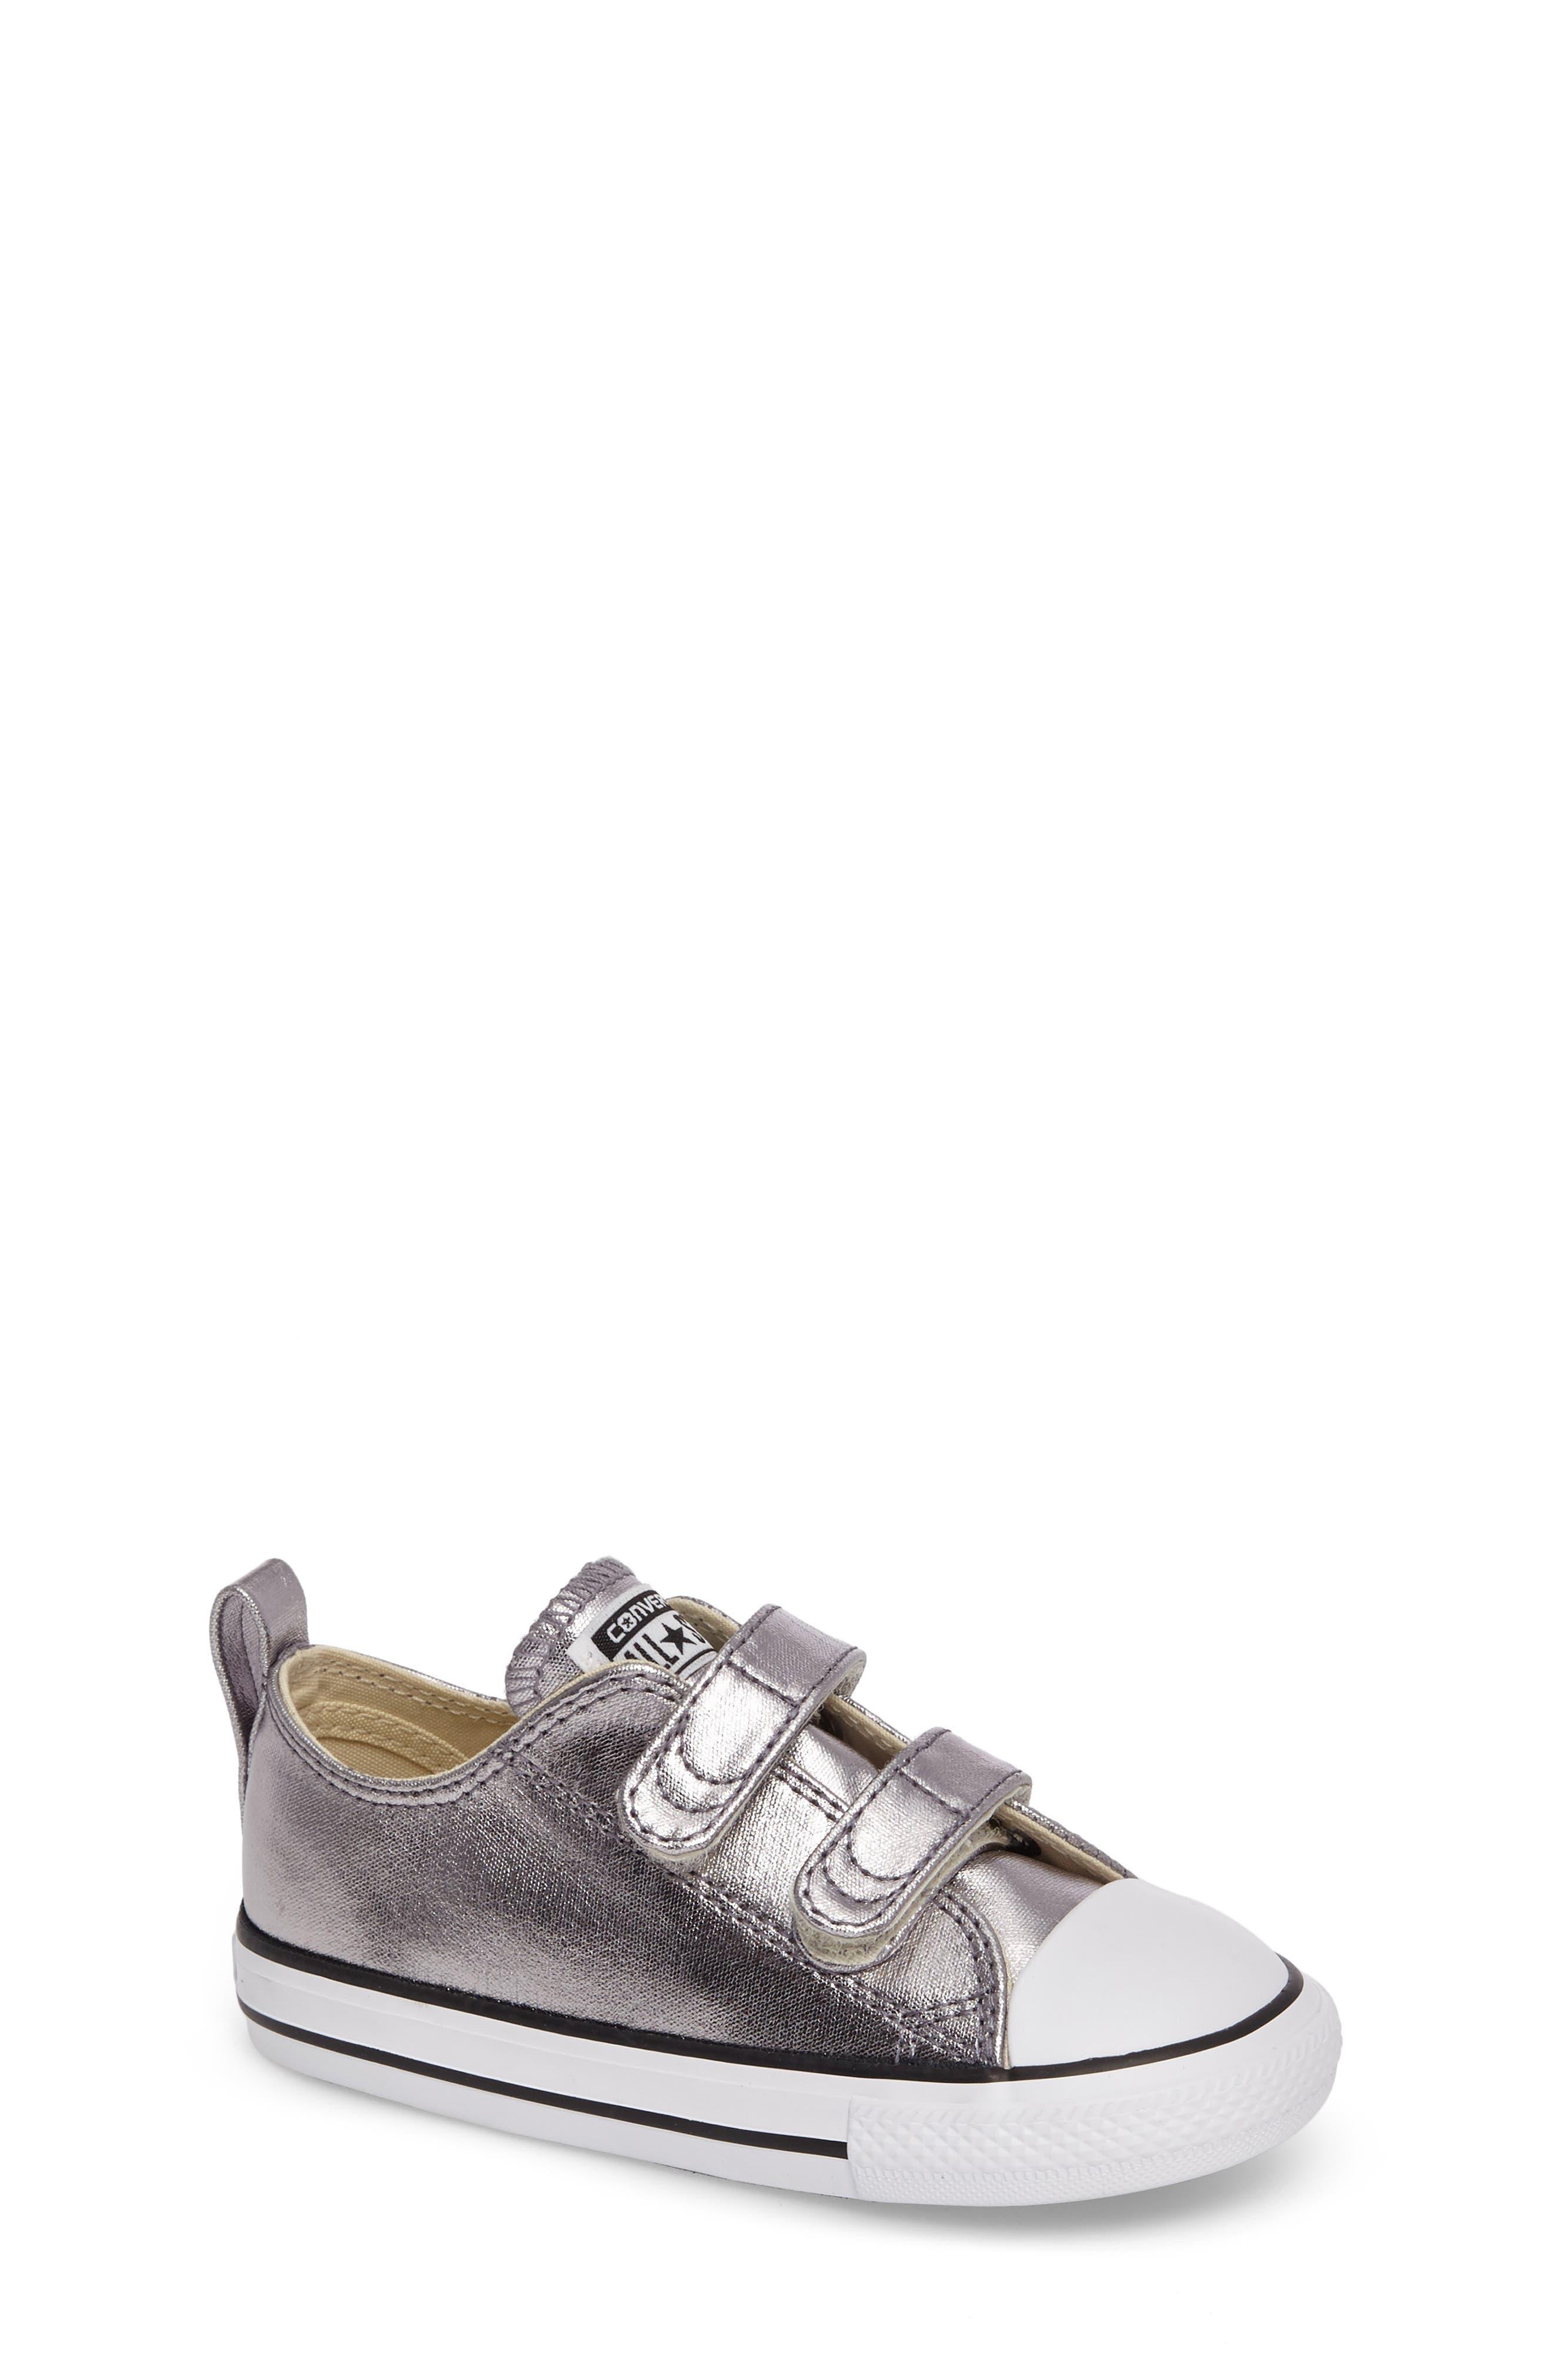 Chuck Taylor<sup>®</sup> All Star<sup>®</sup> Seasonal Metallic Low Top Sneaker,                         Main,                         color, 040